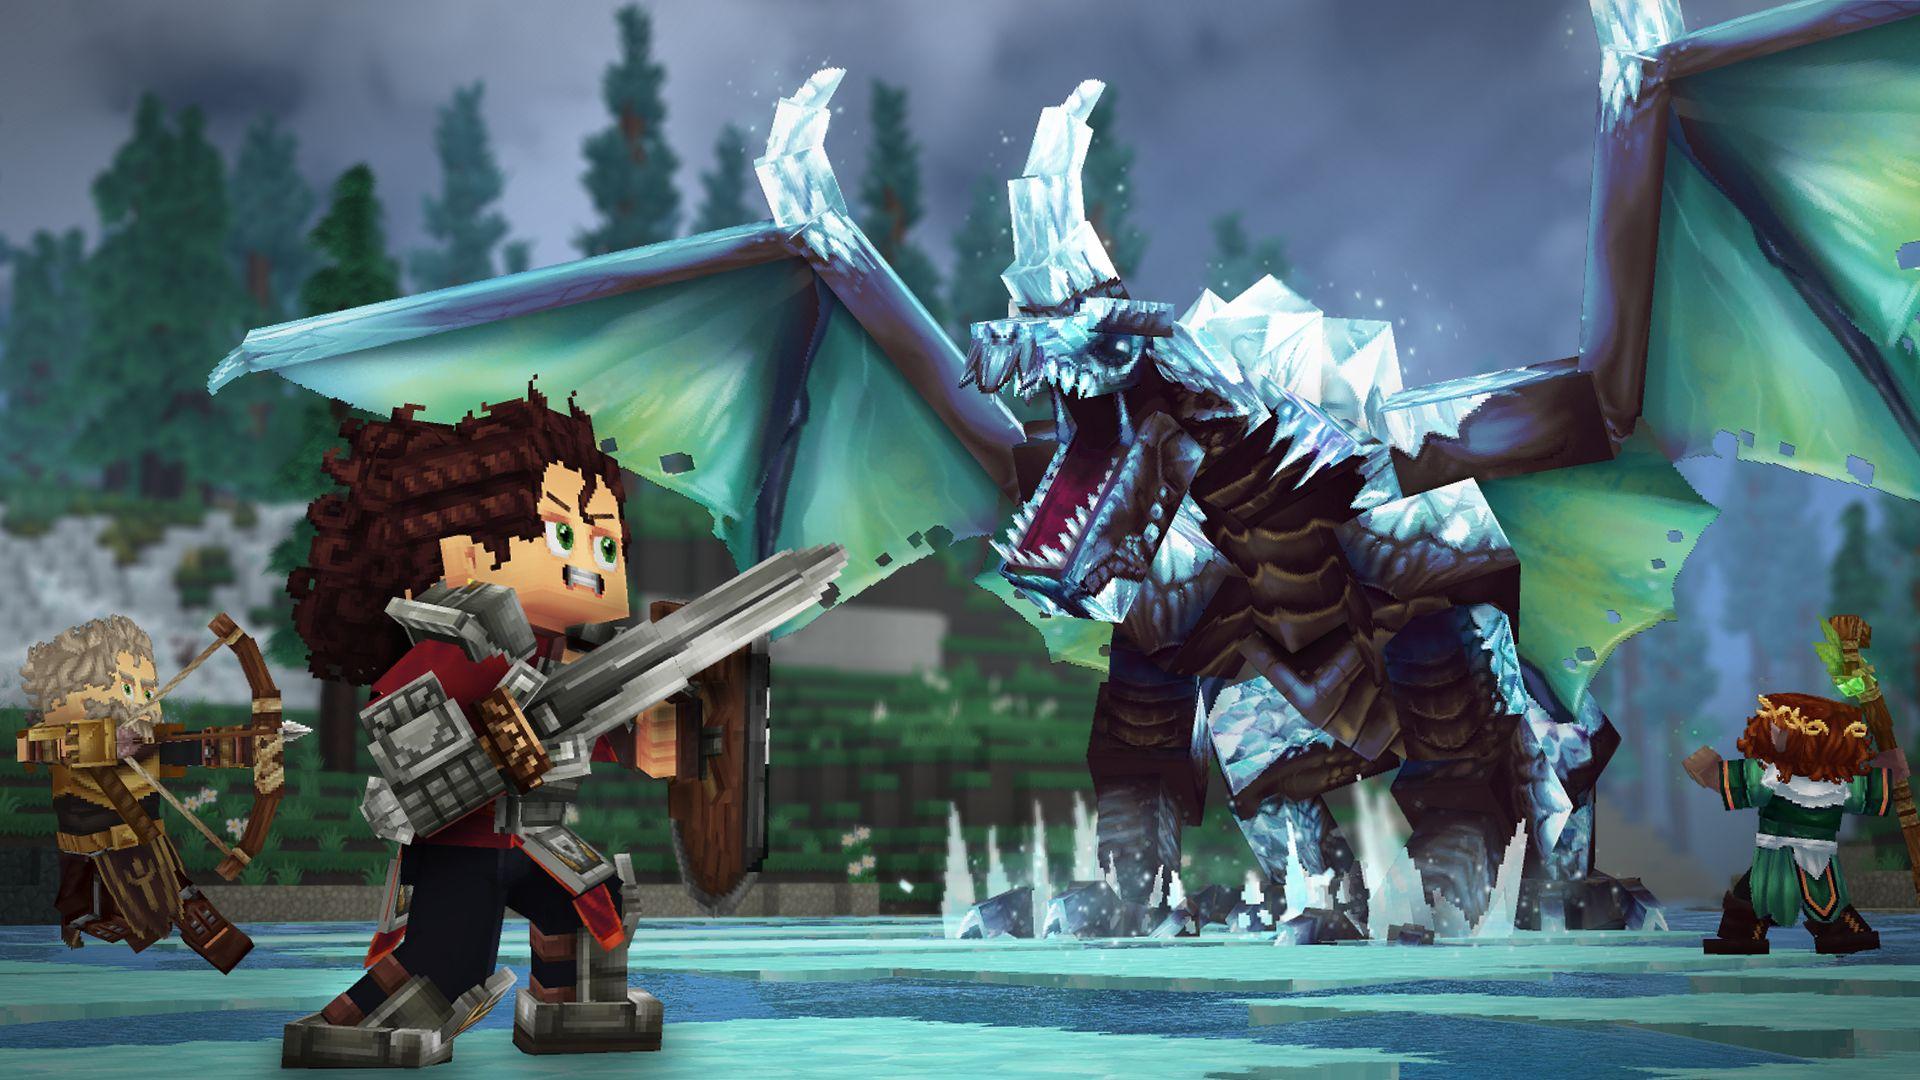 Superstar Mod Team Announces New Mod Focused Game Hytale